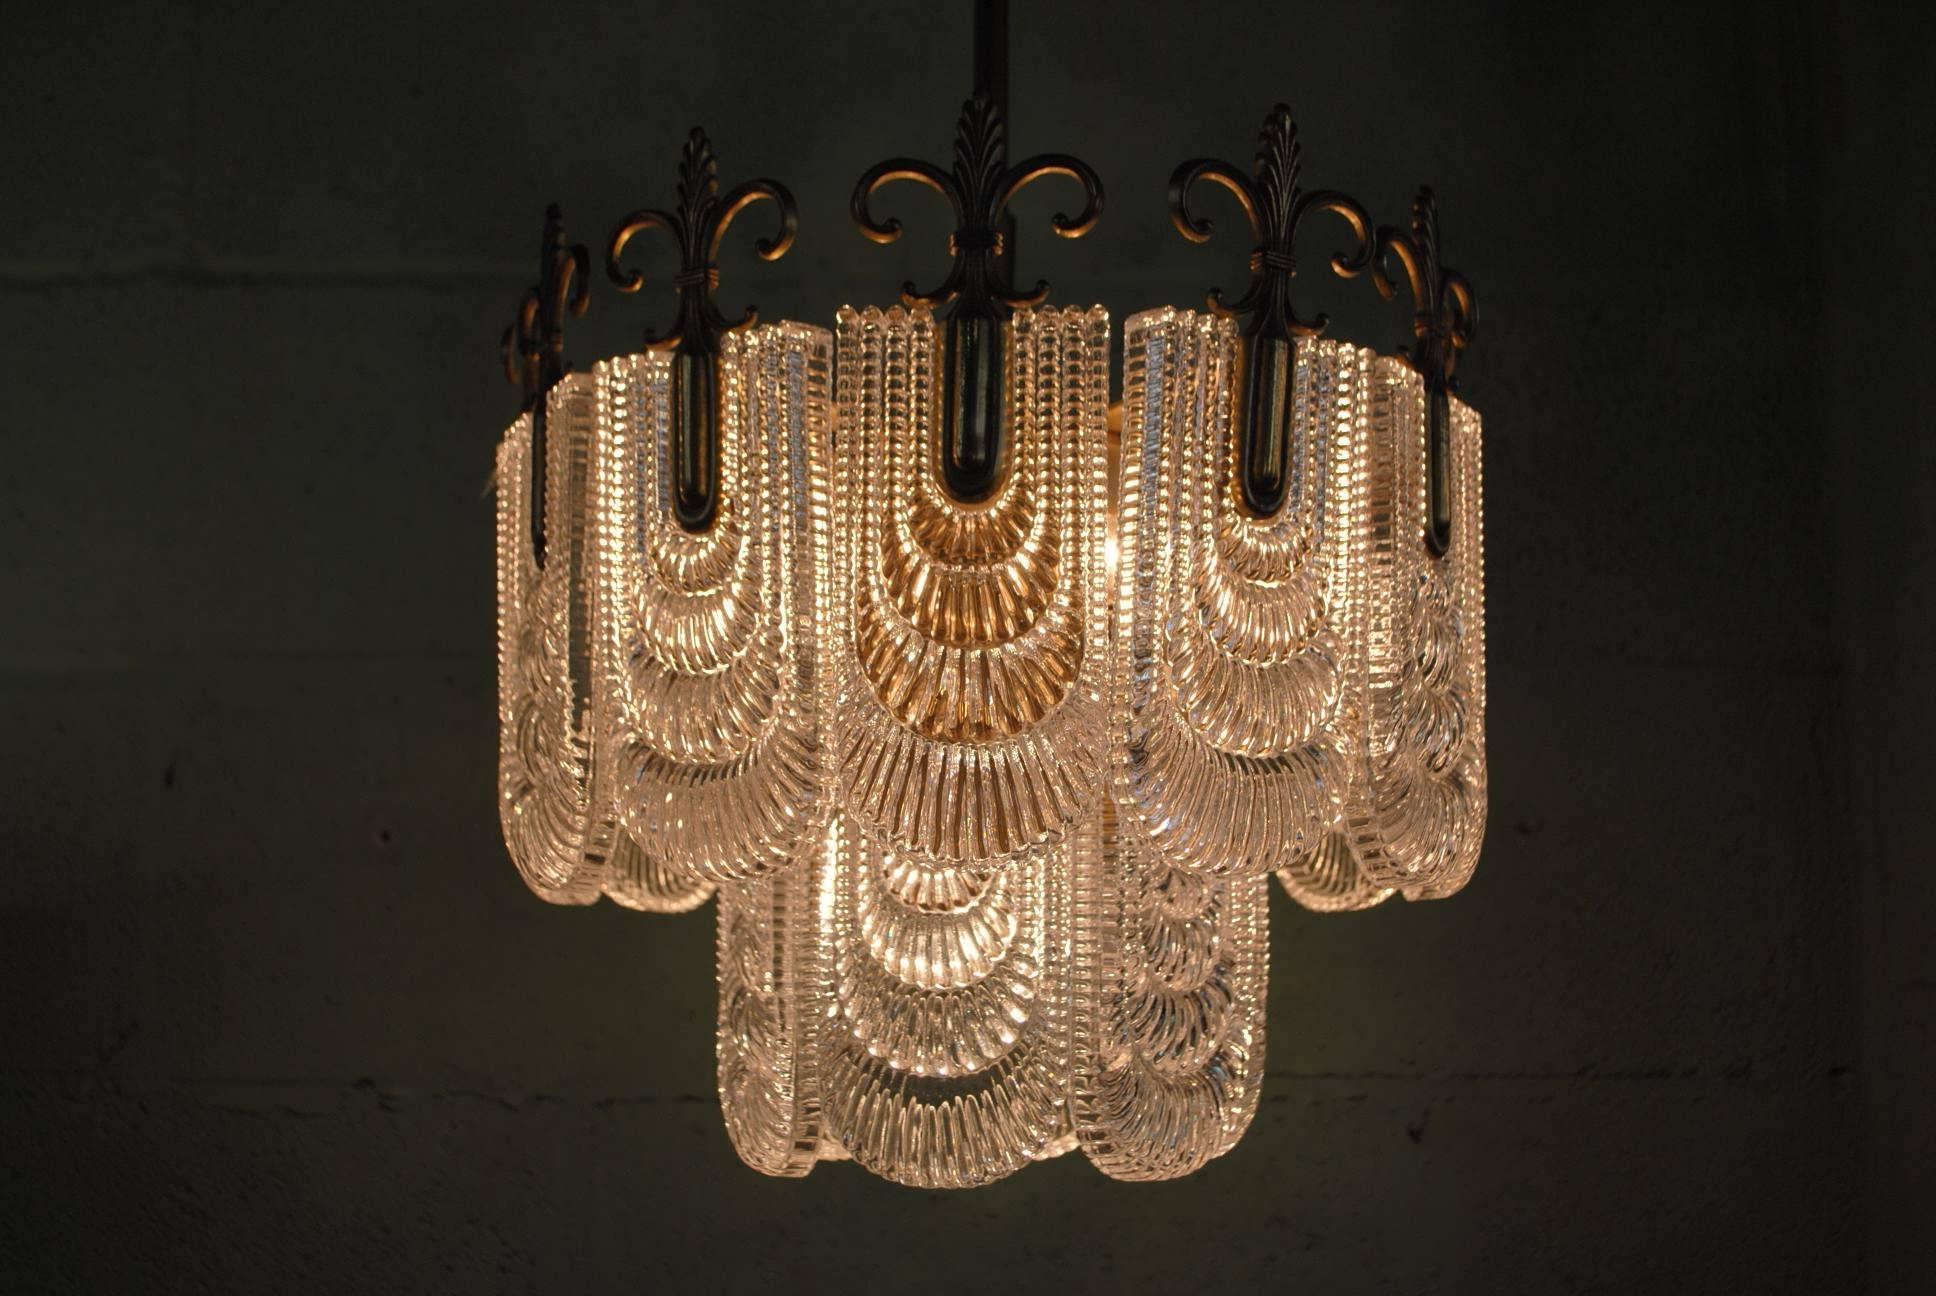 Chandelier : Antique Art Deco Chandelier Art Deco Ceiling Fan Art For Well Liked Art Deco Chandeliers (View 7 of 15)